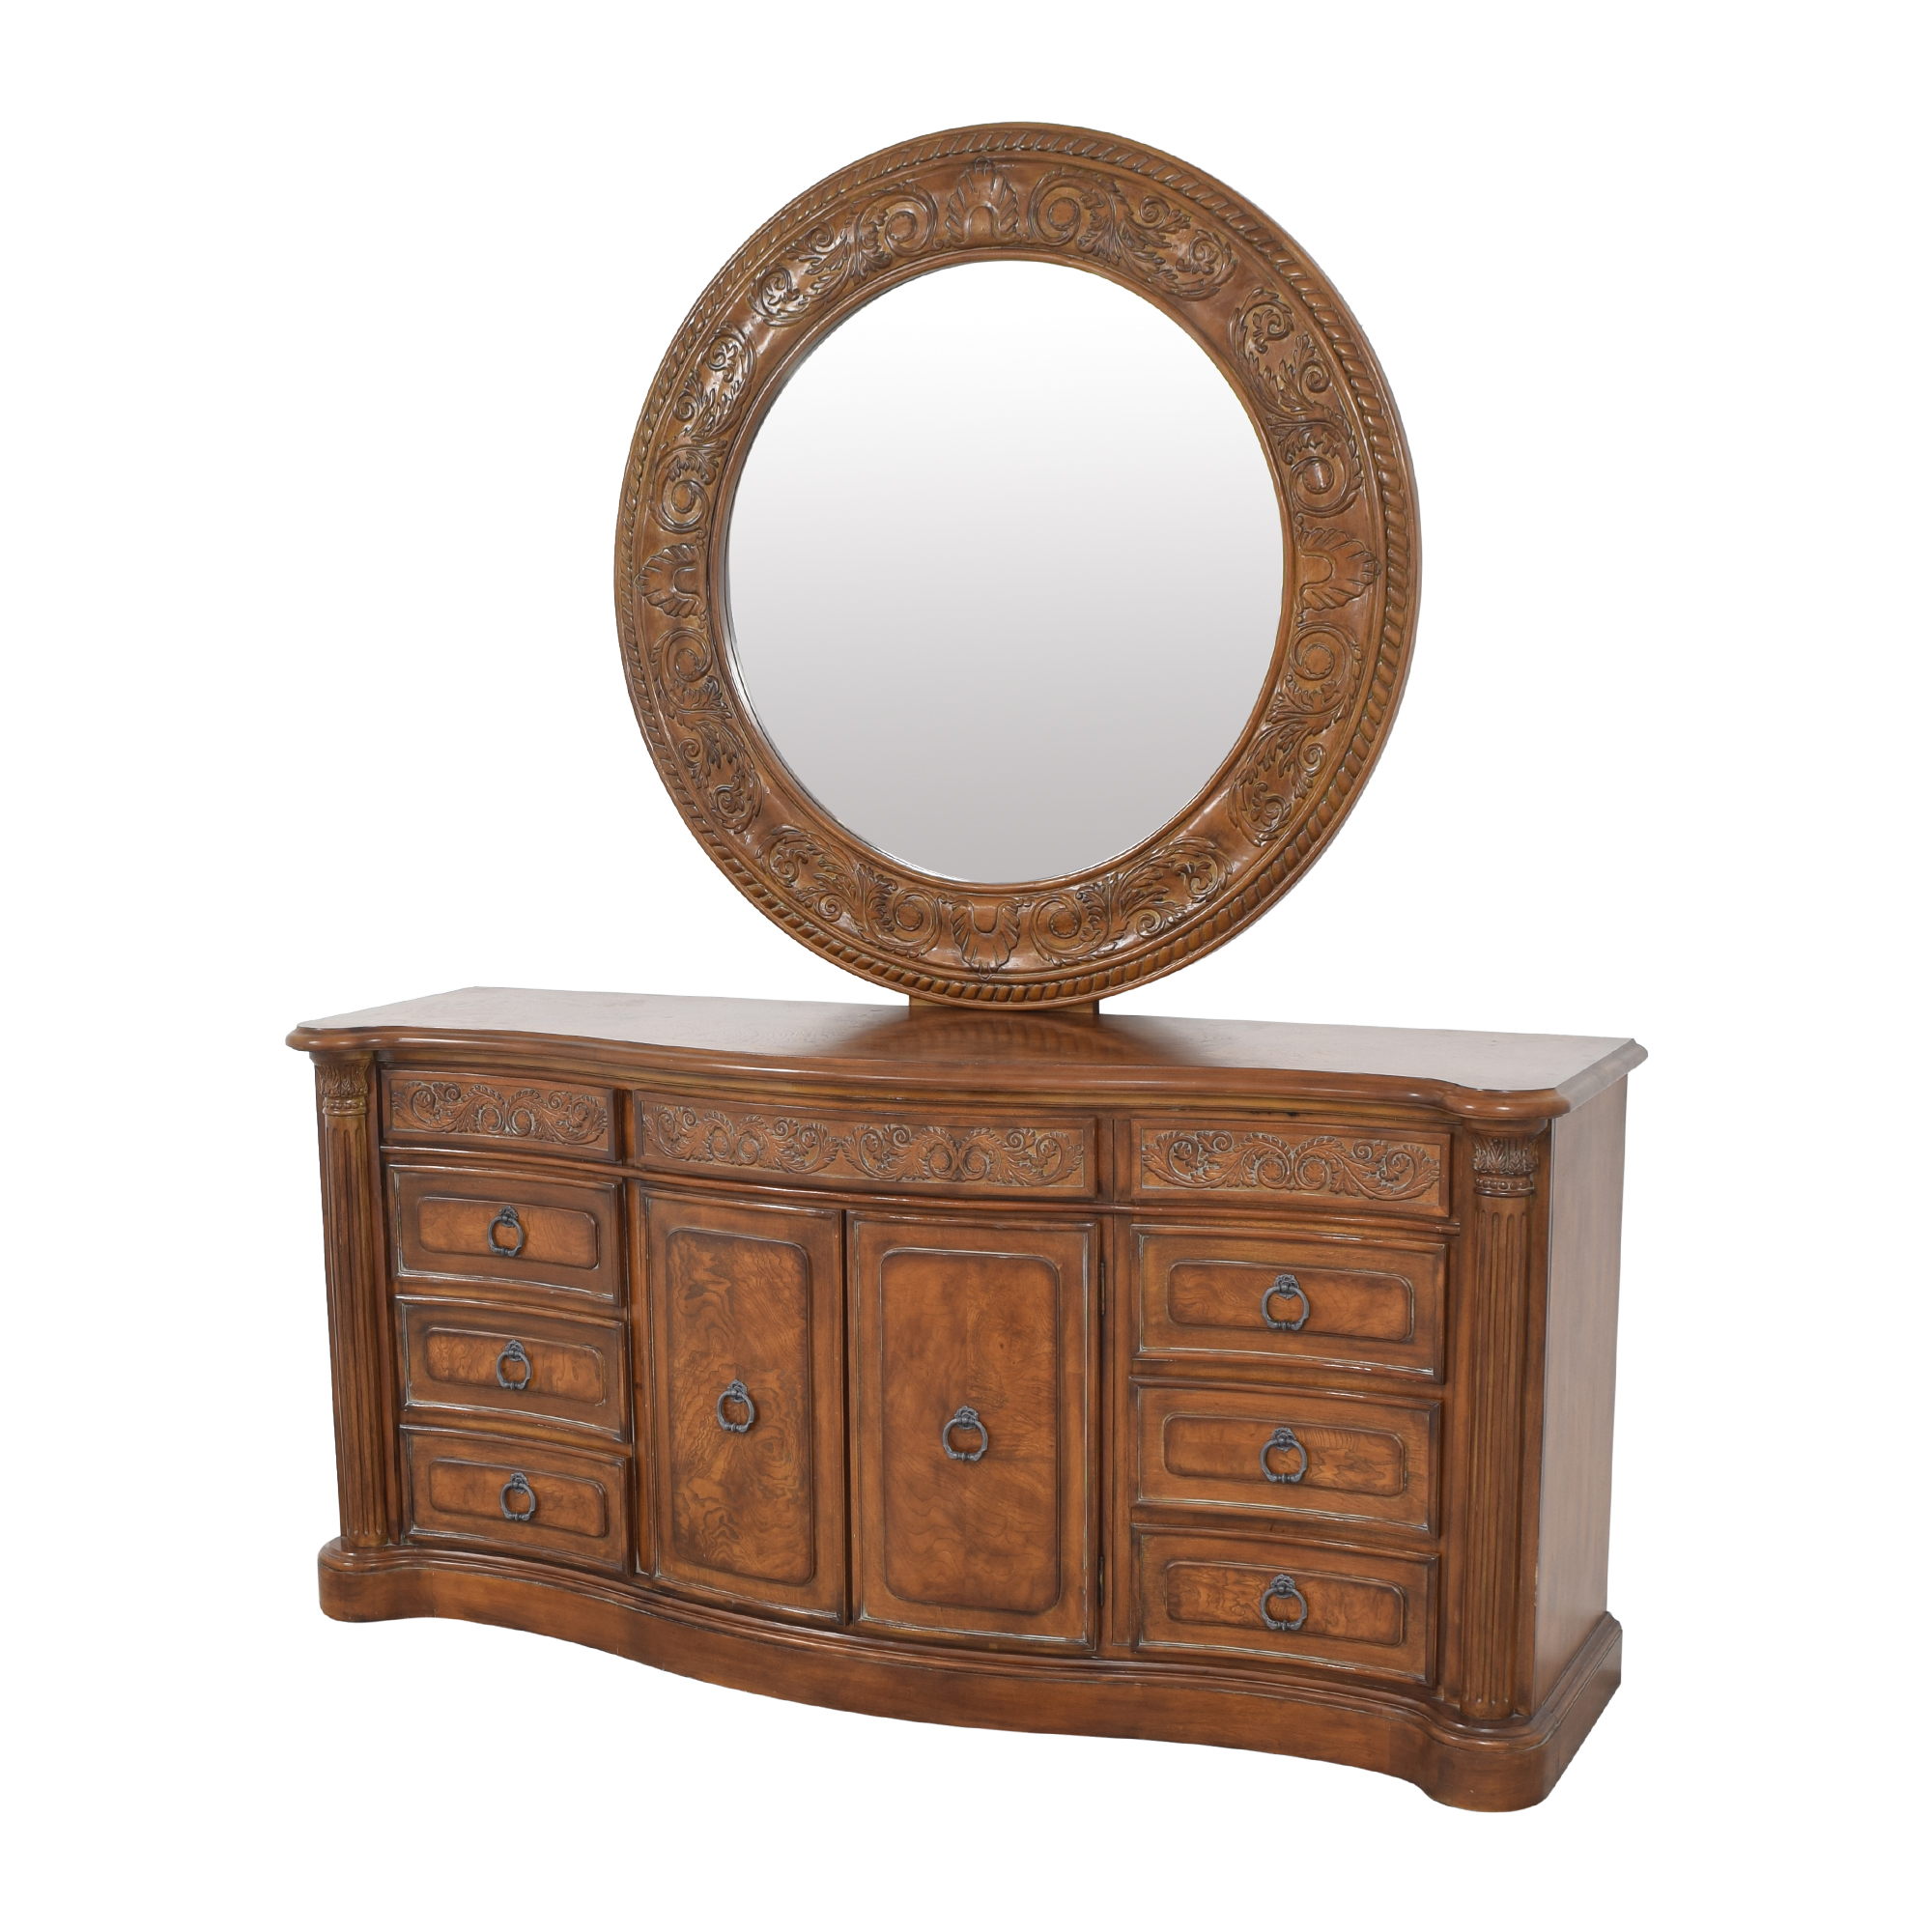 Collezione Europa Dresser with Oval Mirror / Dressers